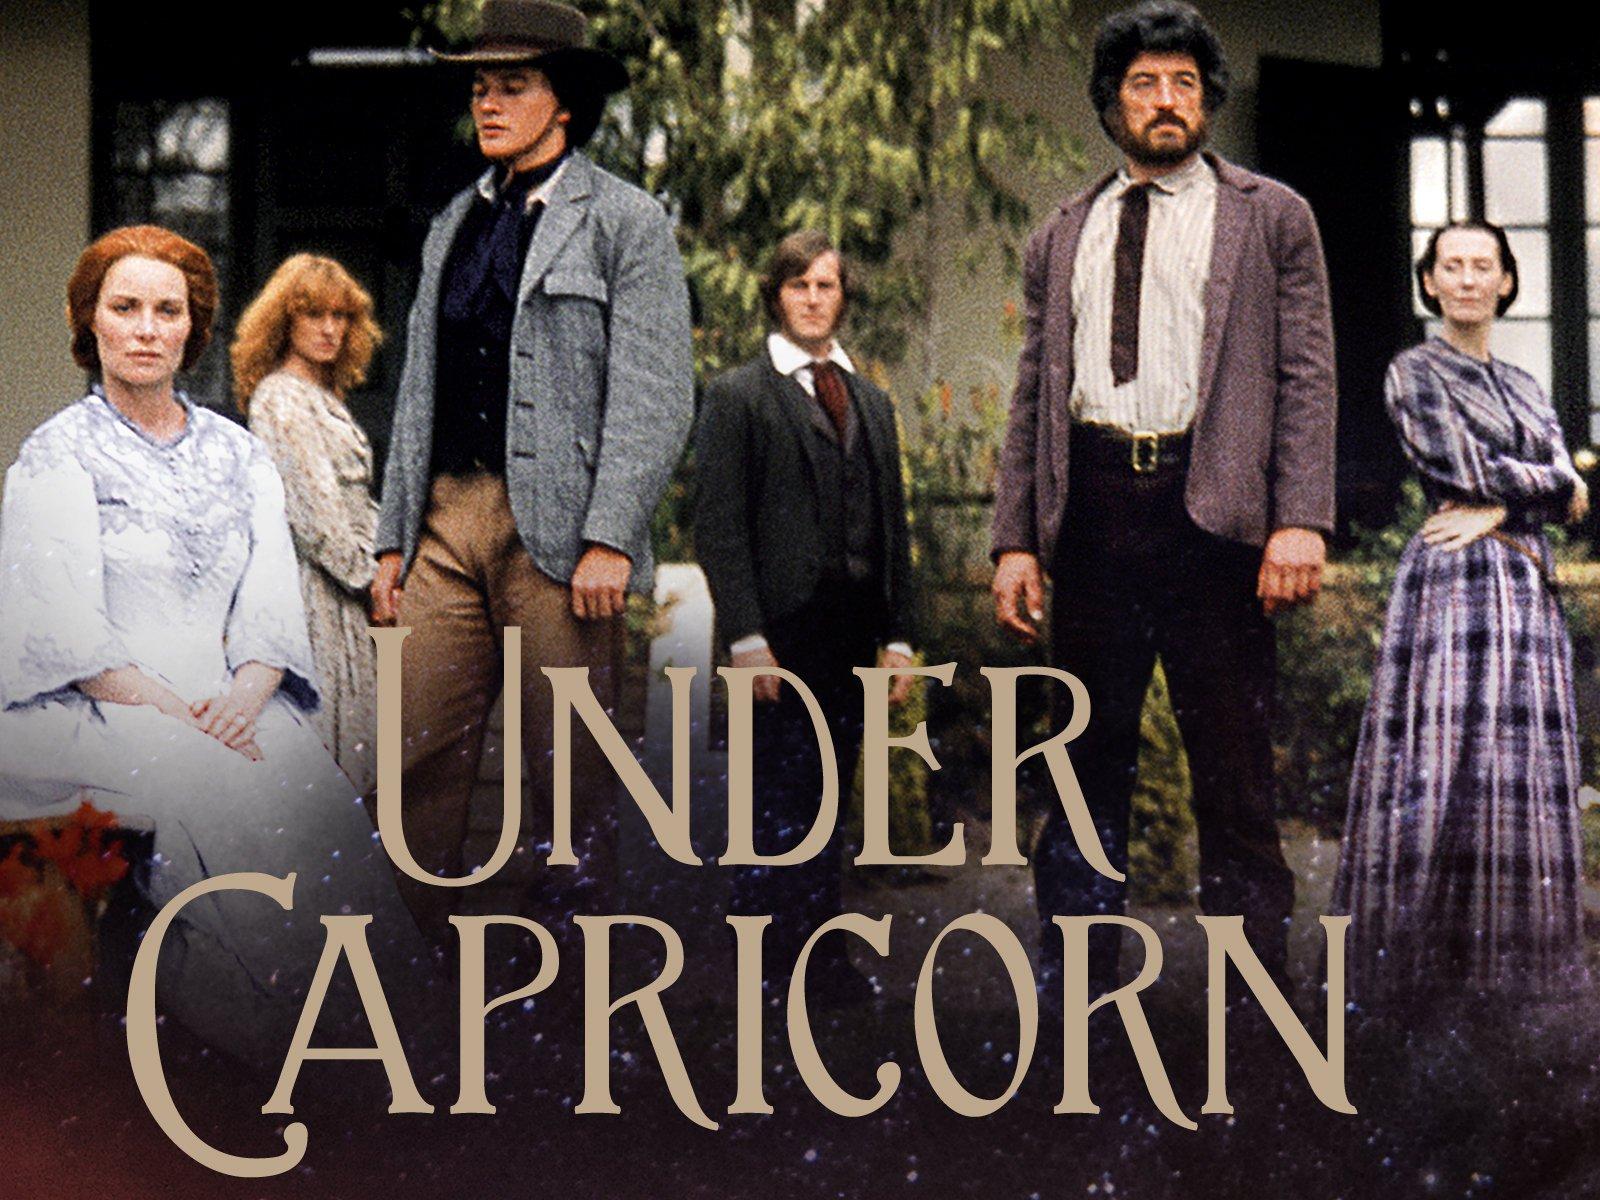 Under Capricorn (1982) TV miniseries